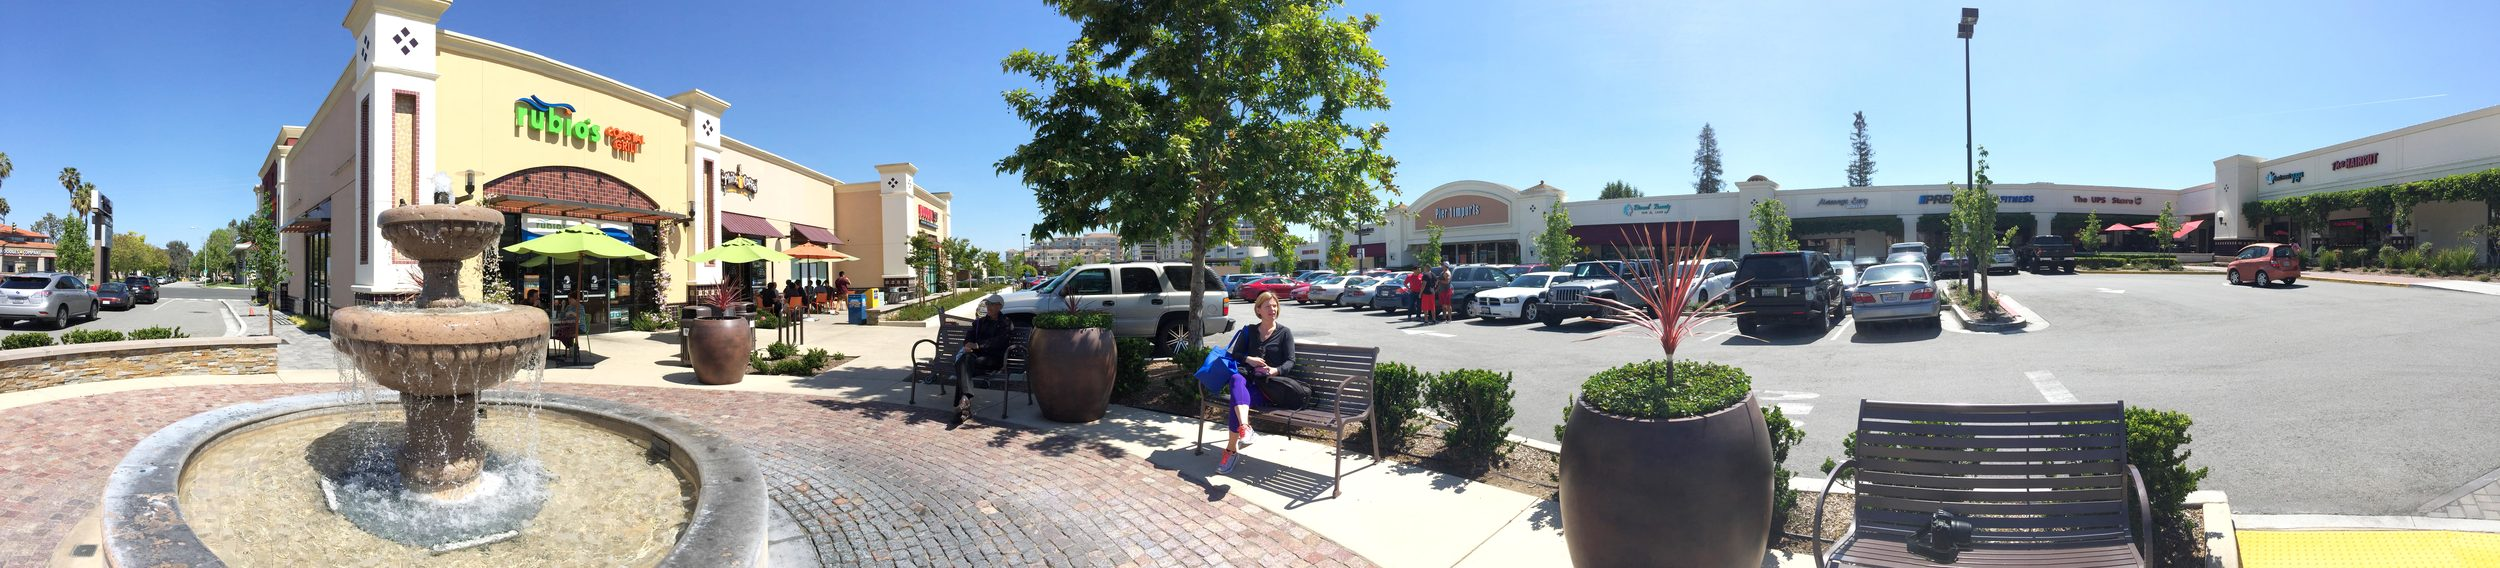 Cupertino Crossroads Shopping Center